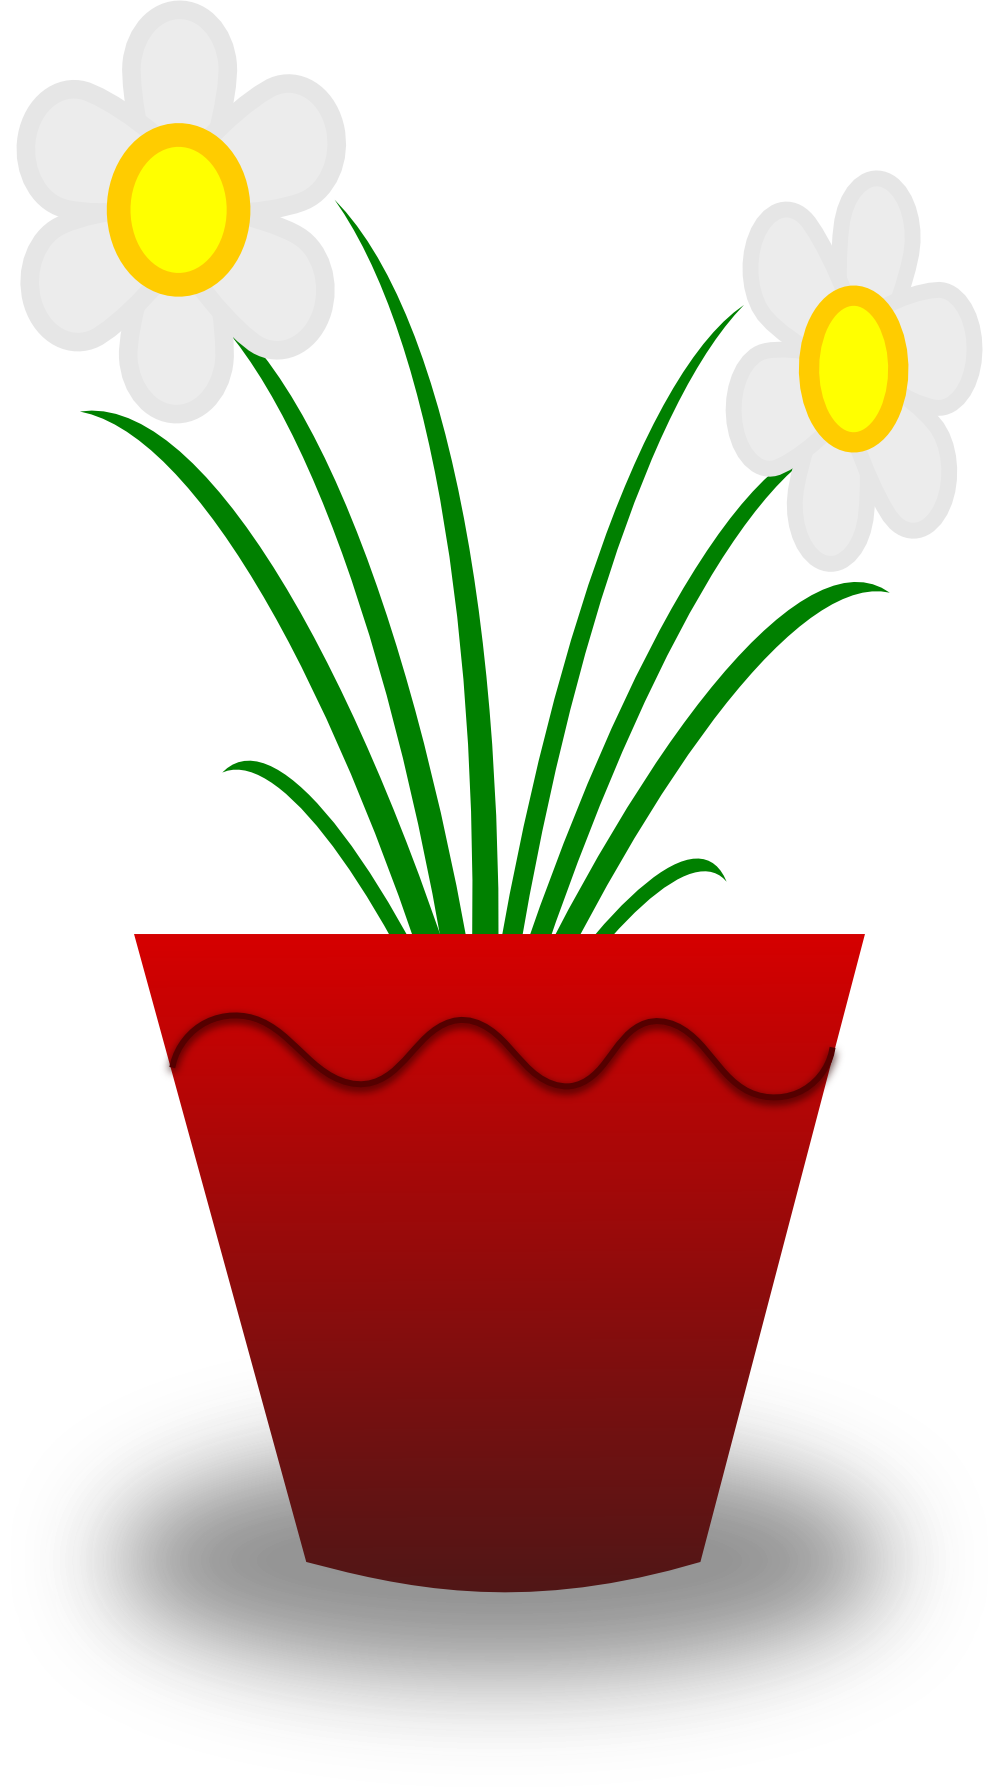 Flower Pots Clip Art - Vector Clip Art Online, Royalty ...